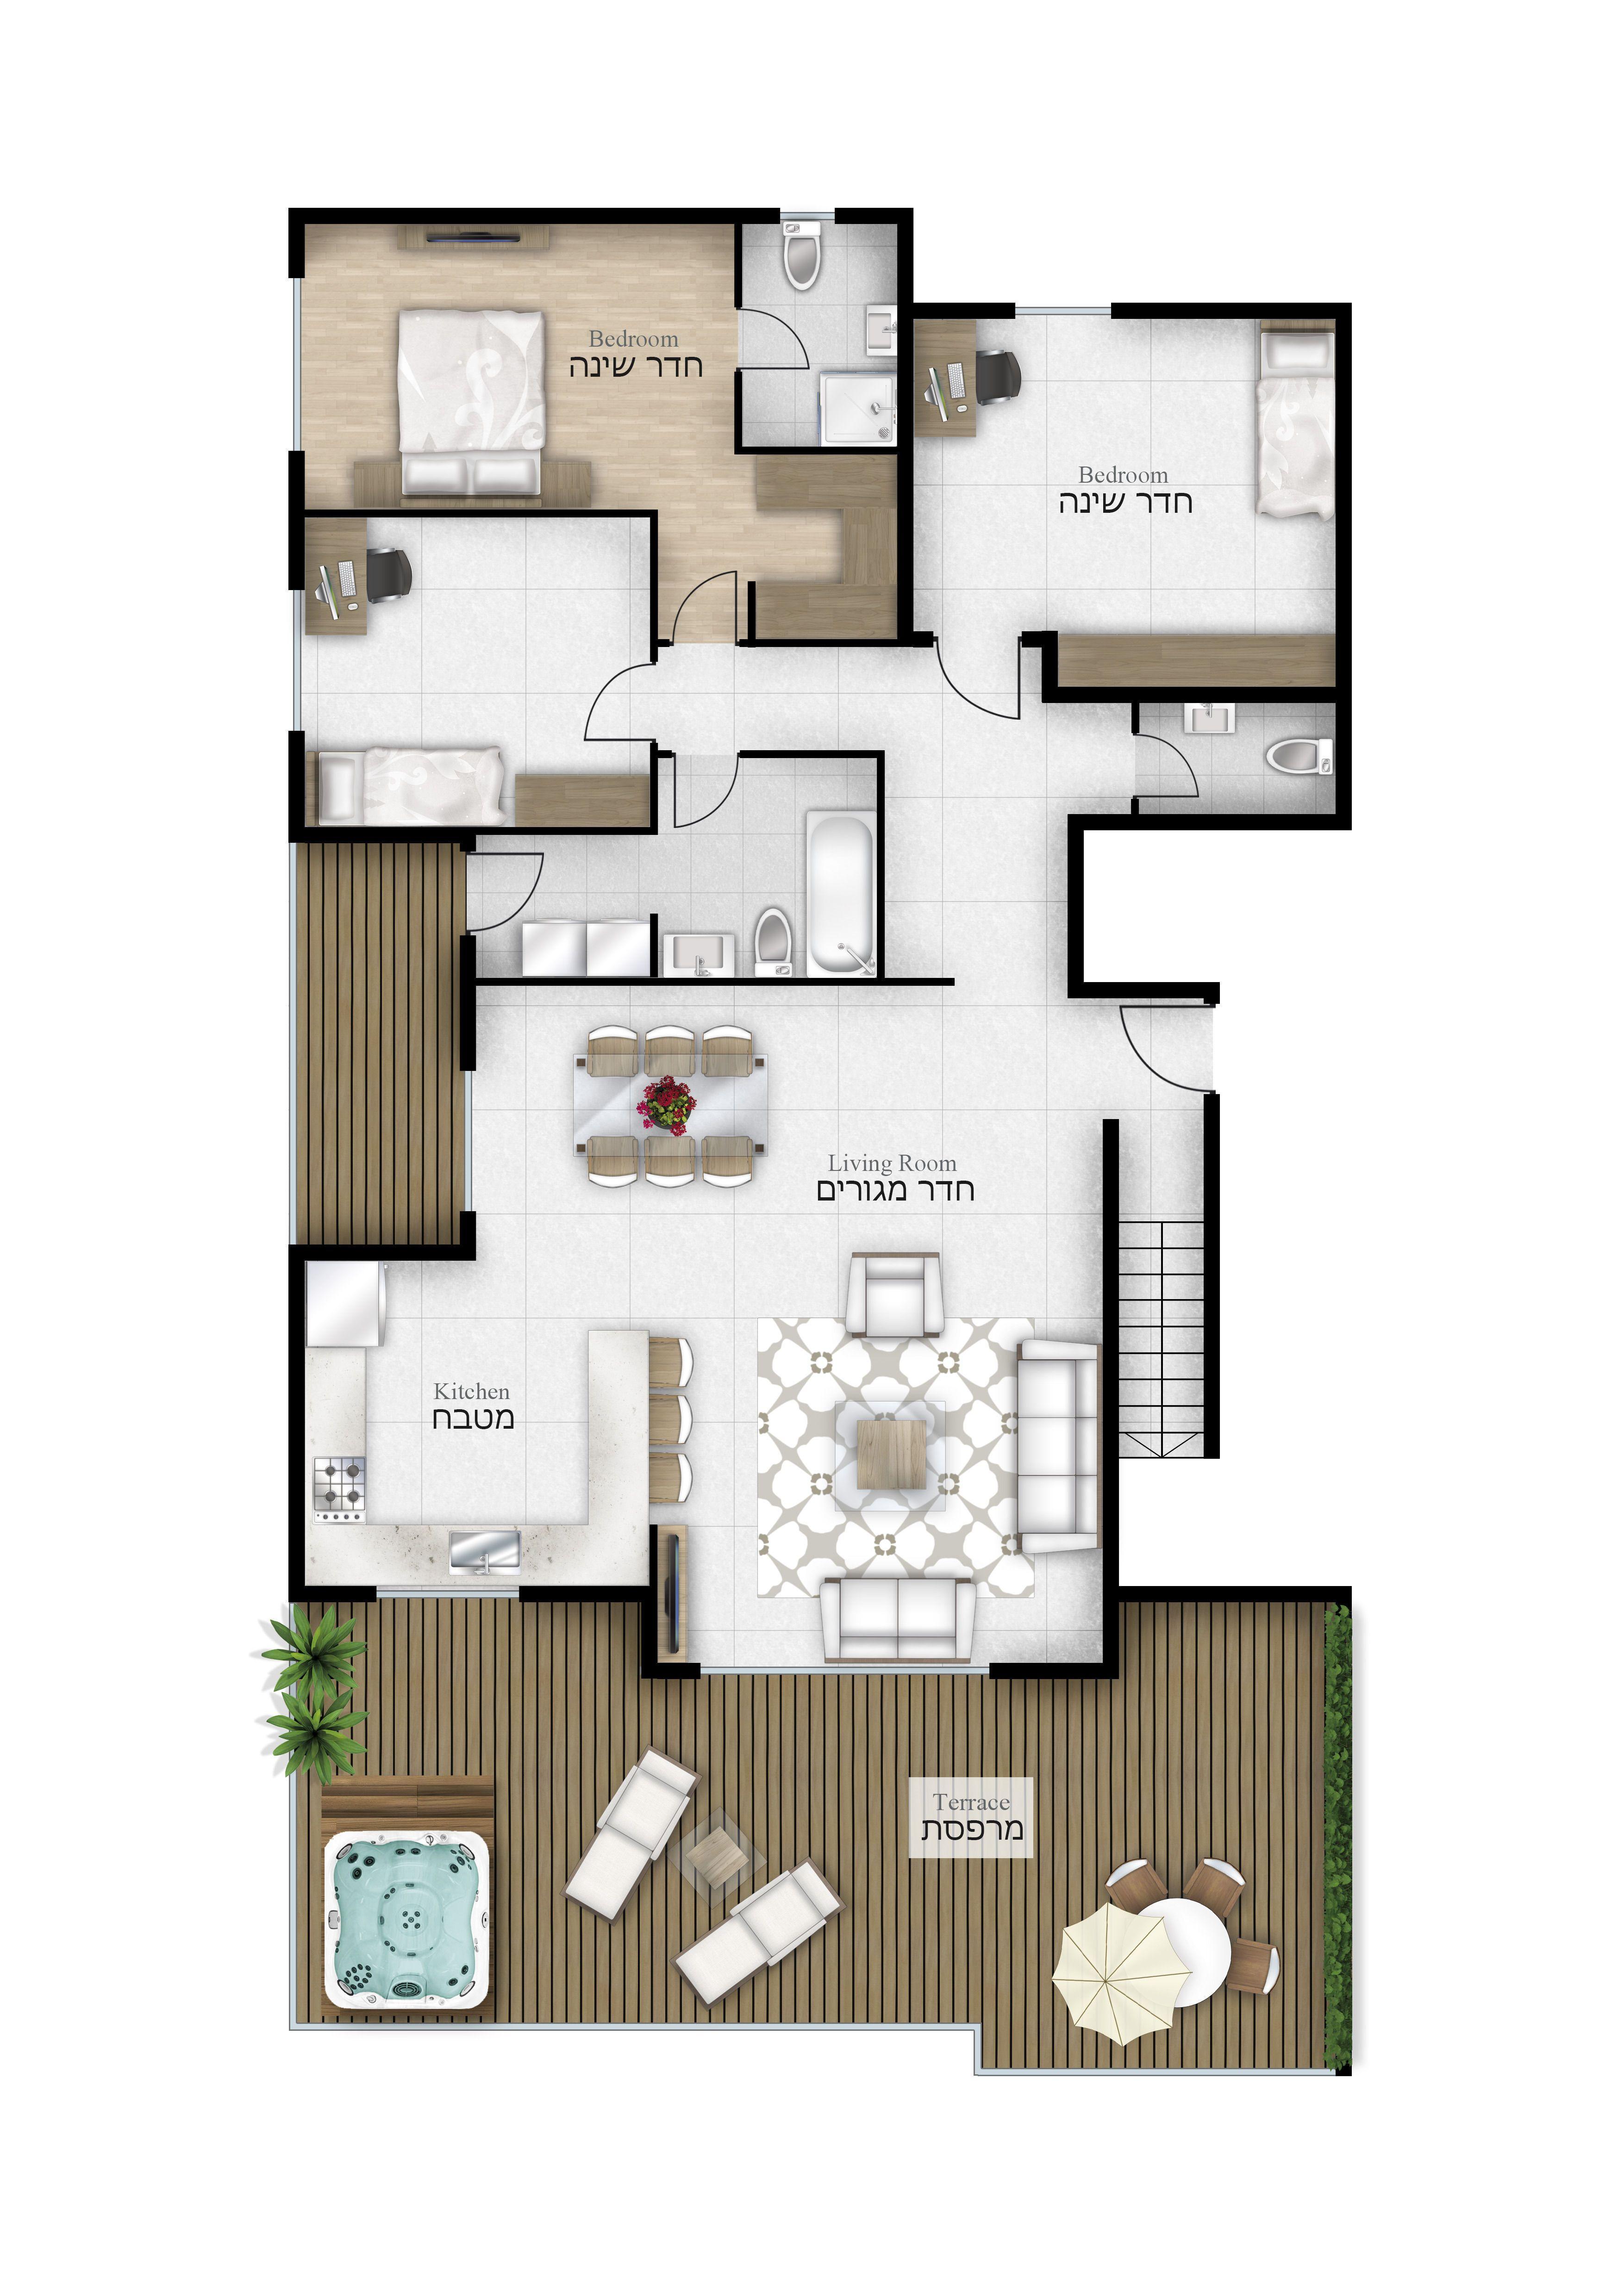 forniture plans 2d furniture floorplan top down view psd 3d model